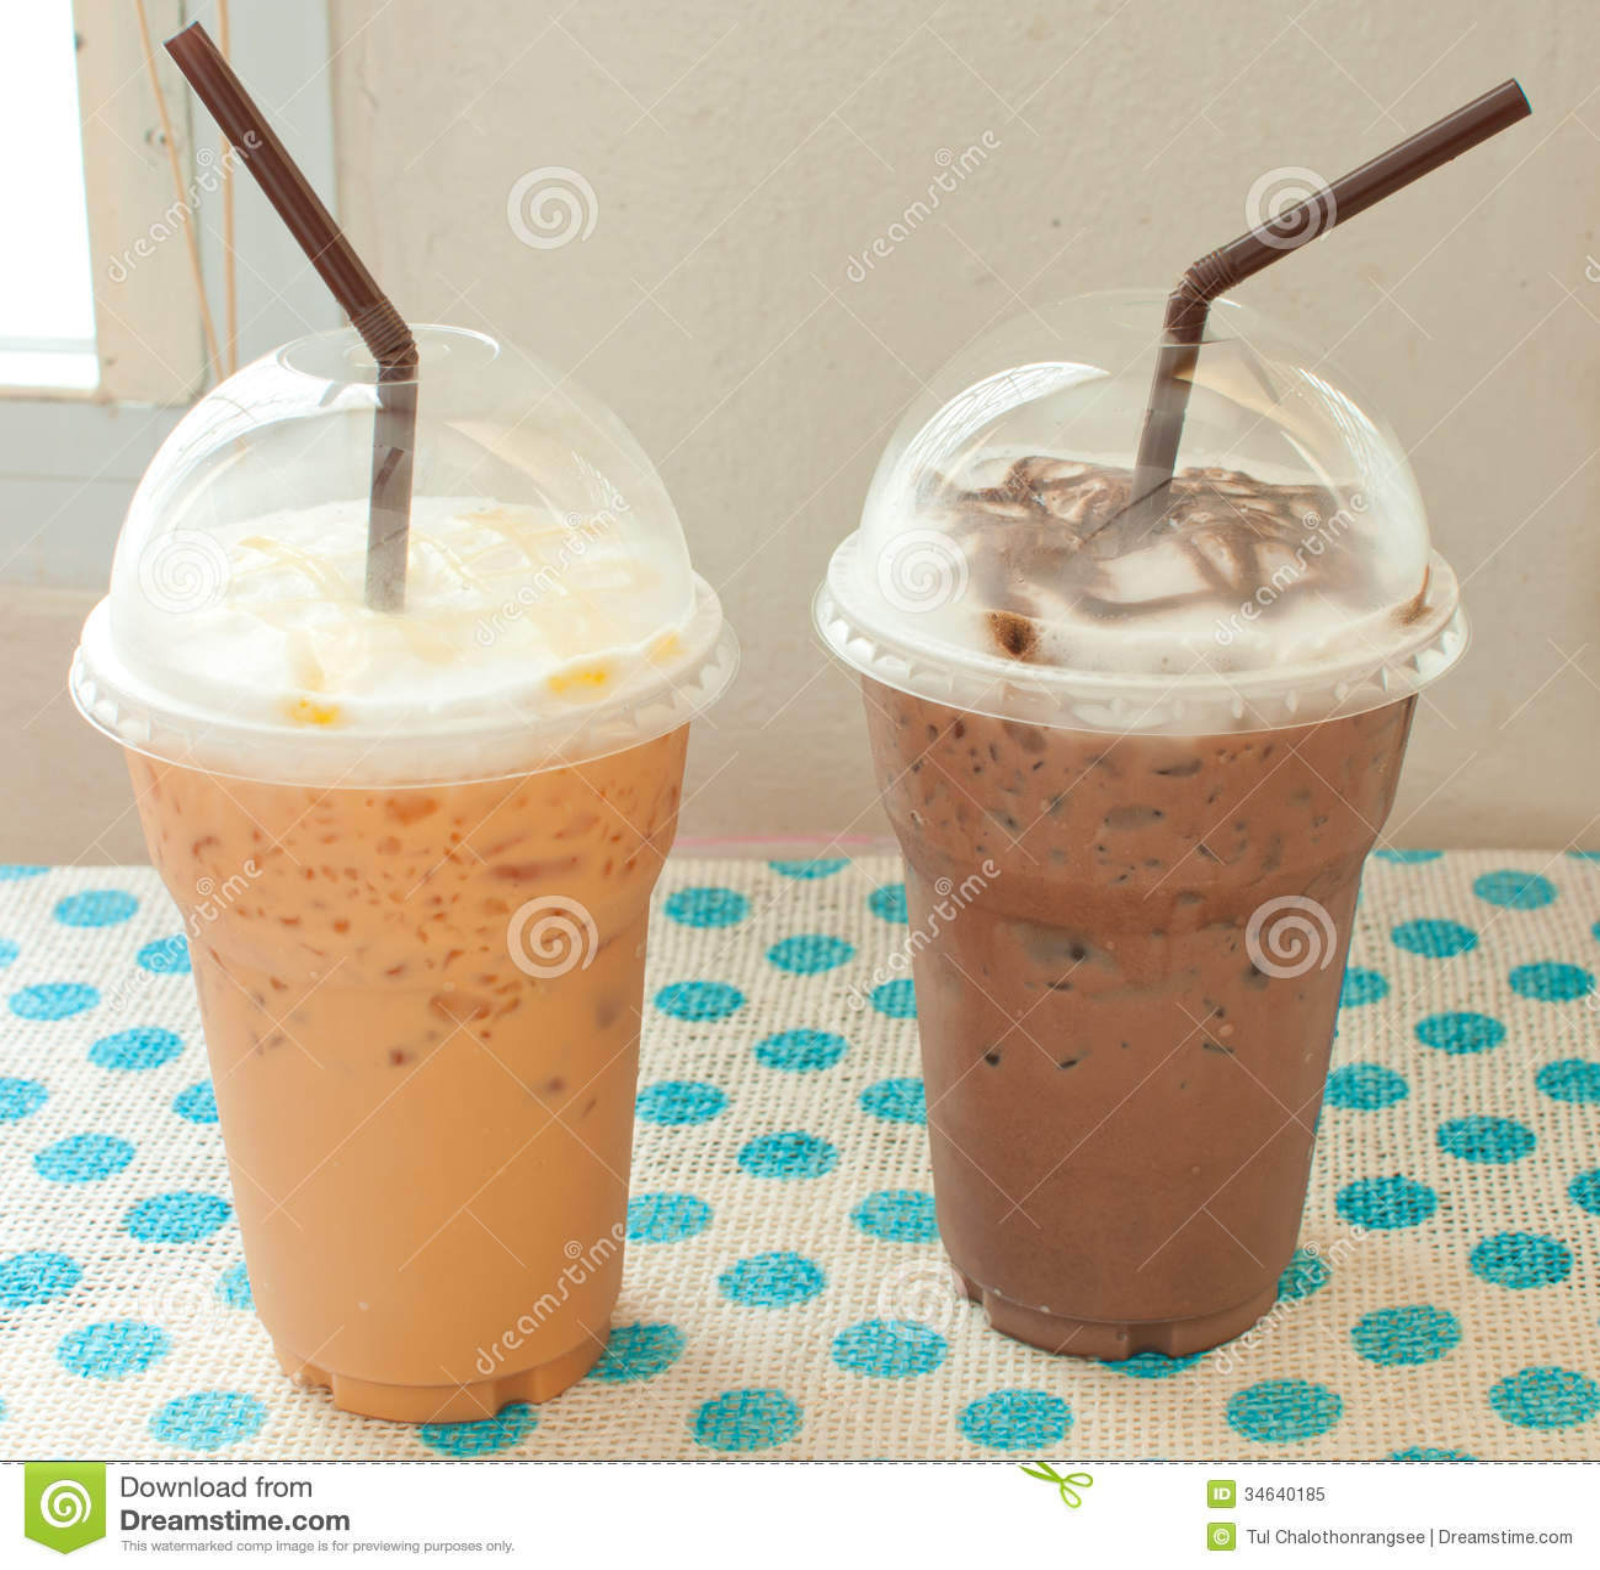 Thai Iced Tea With Iced Chocolate Stock Image - Image ...